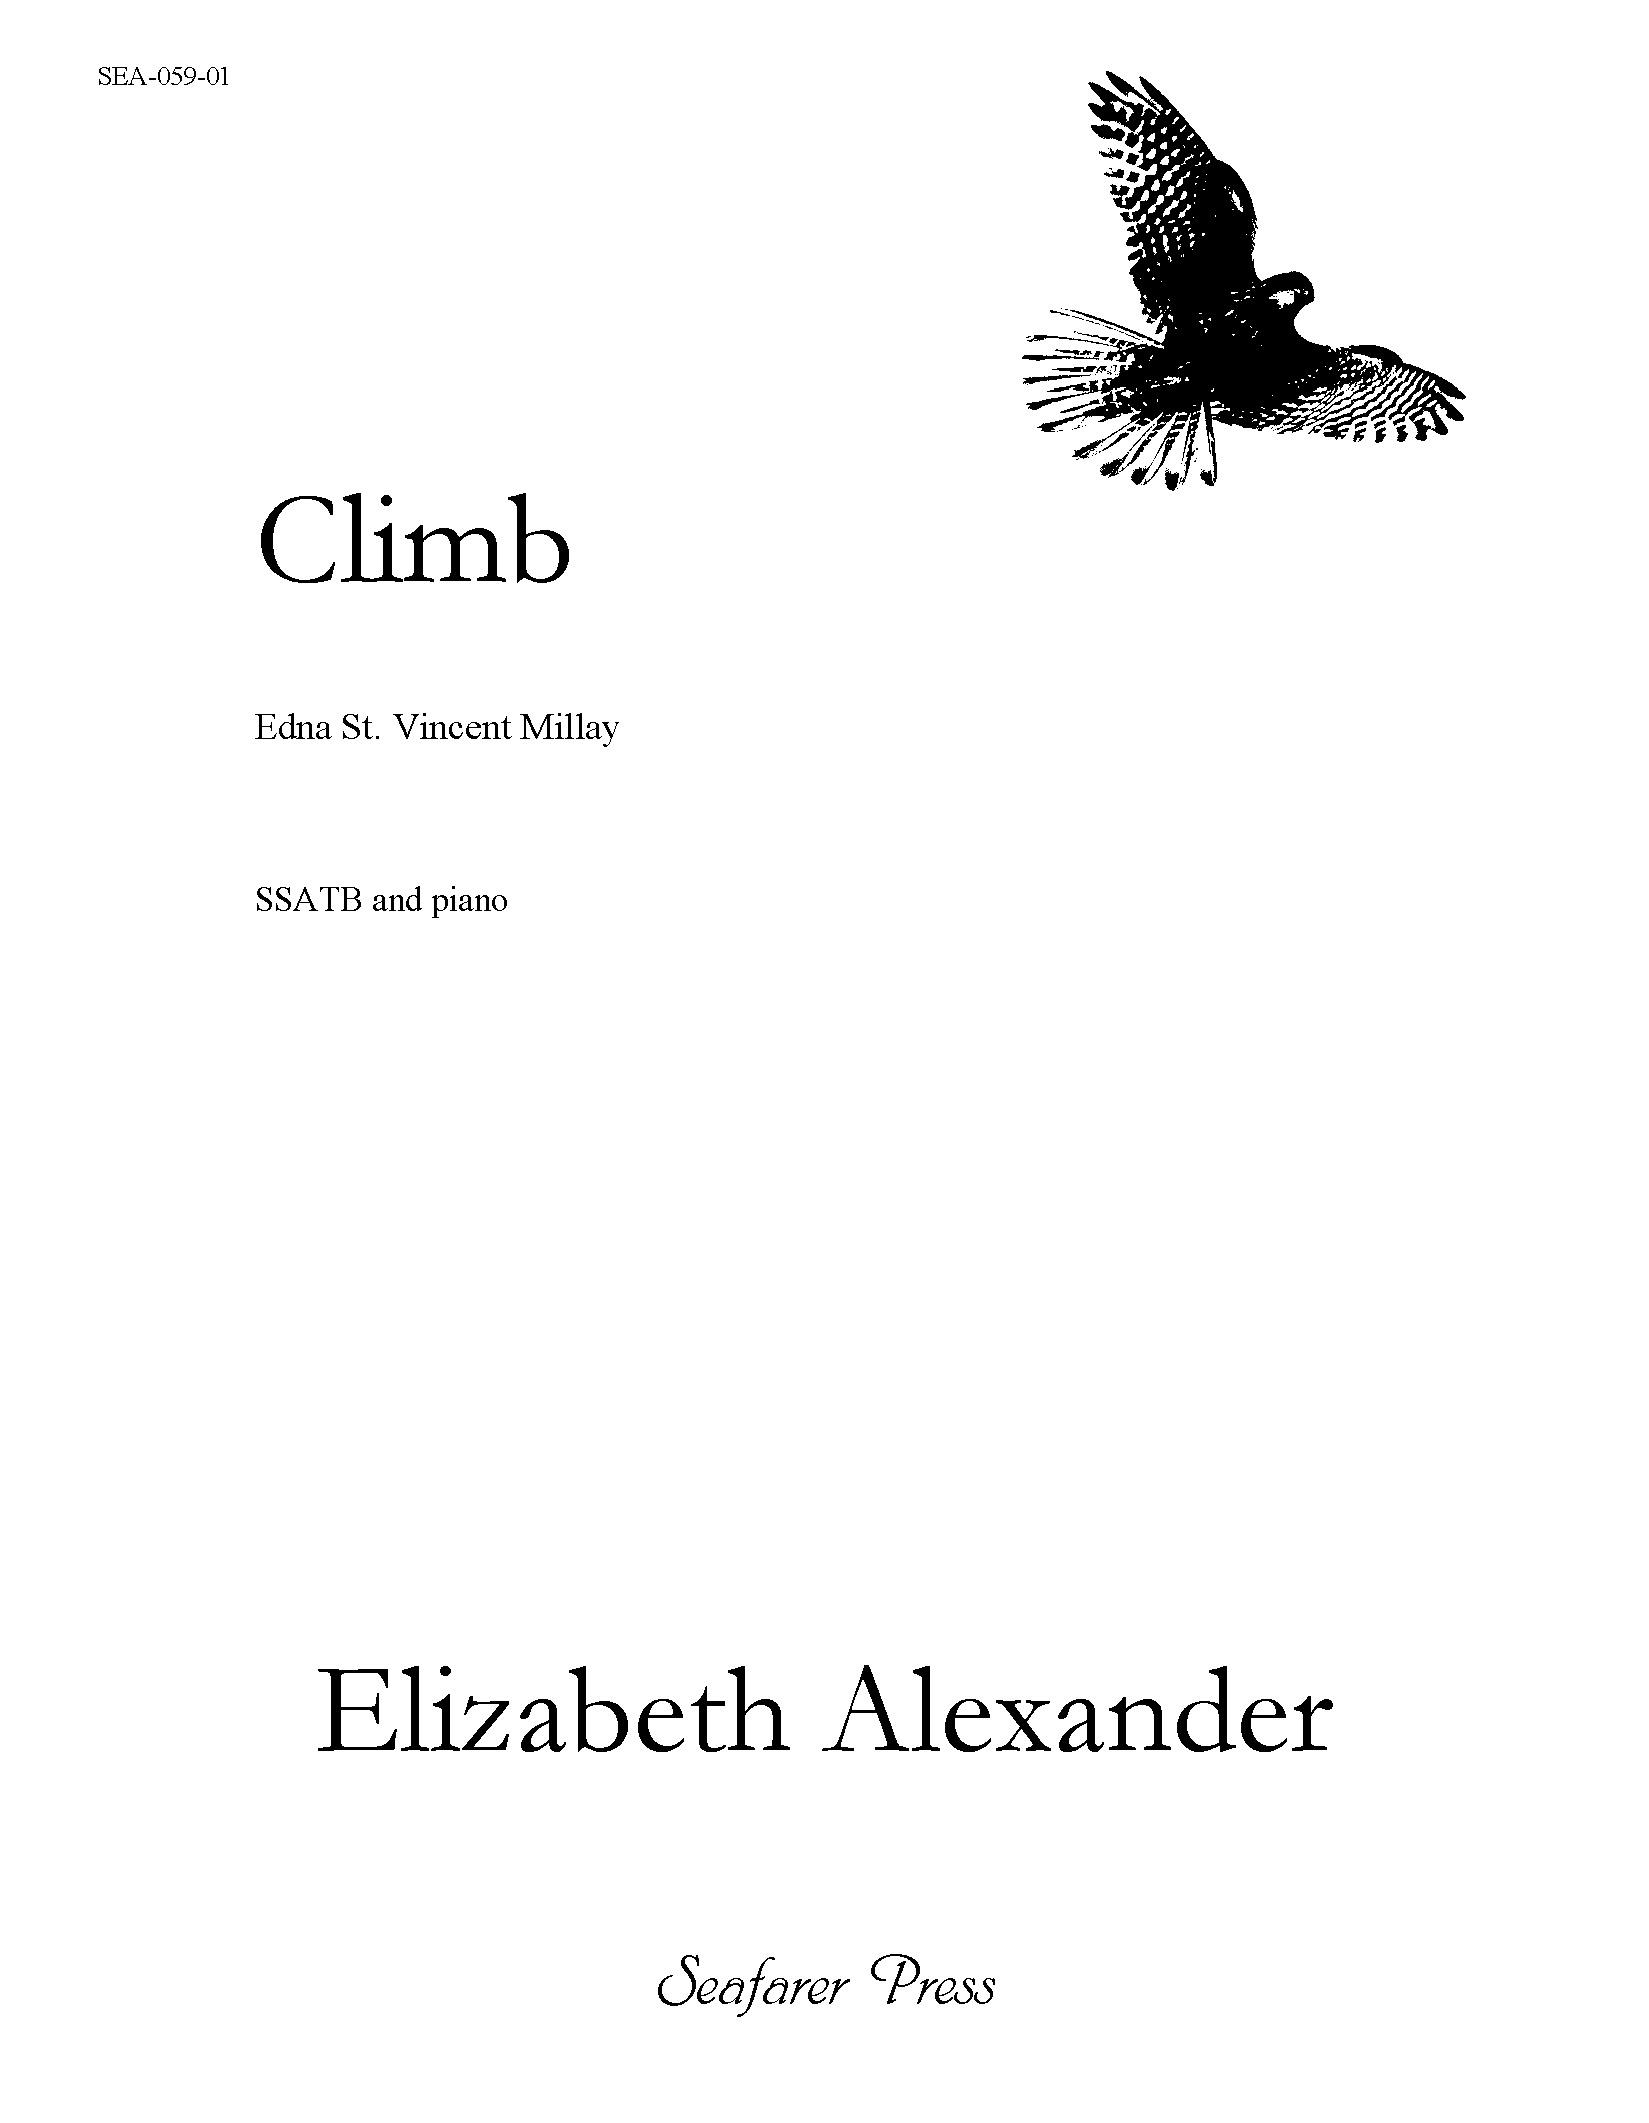 SEA-059-01 - Climb